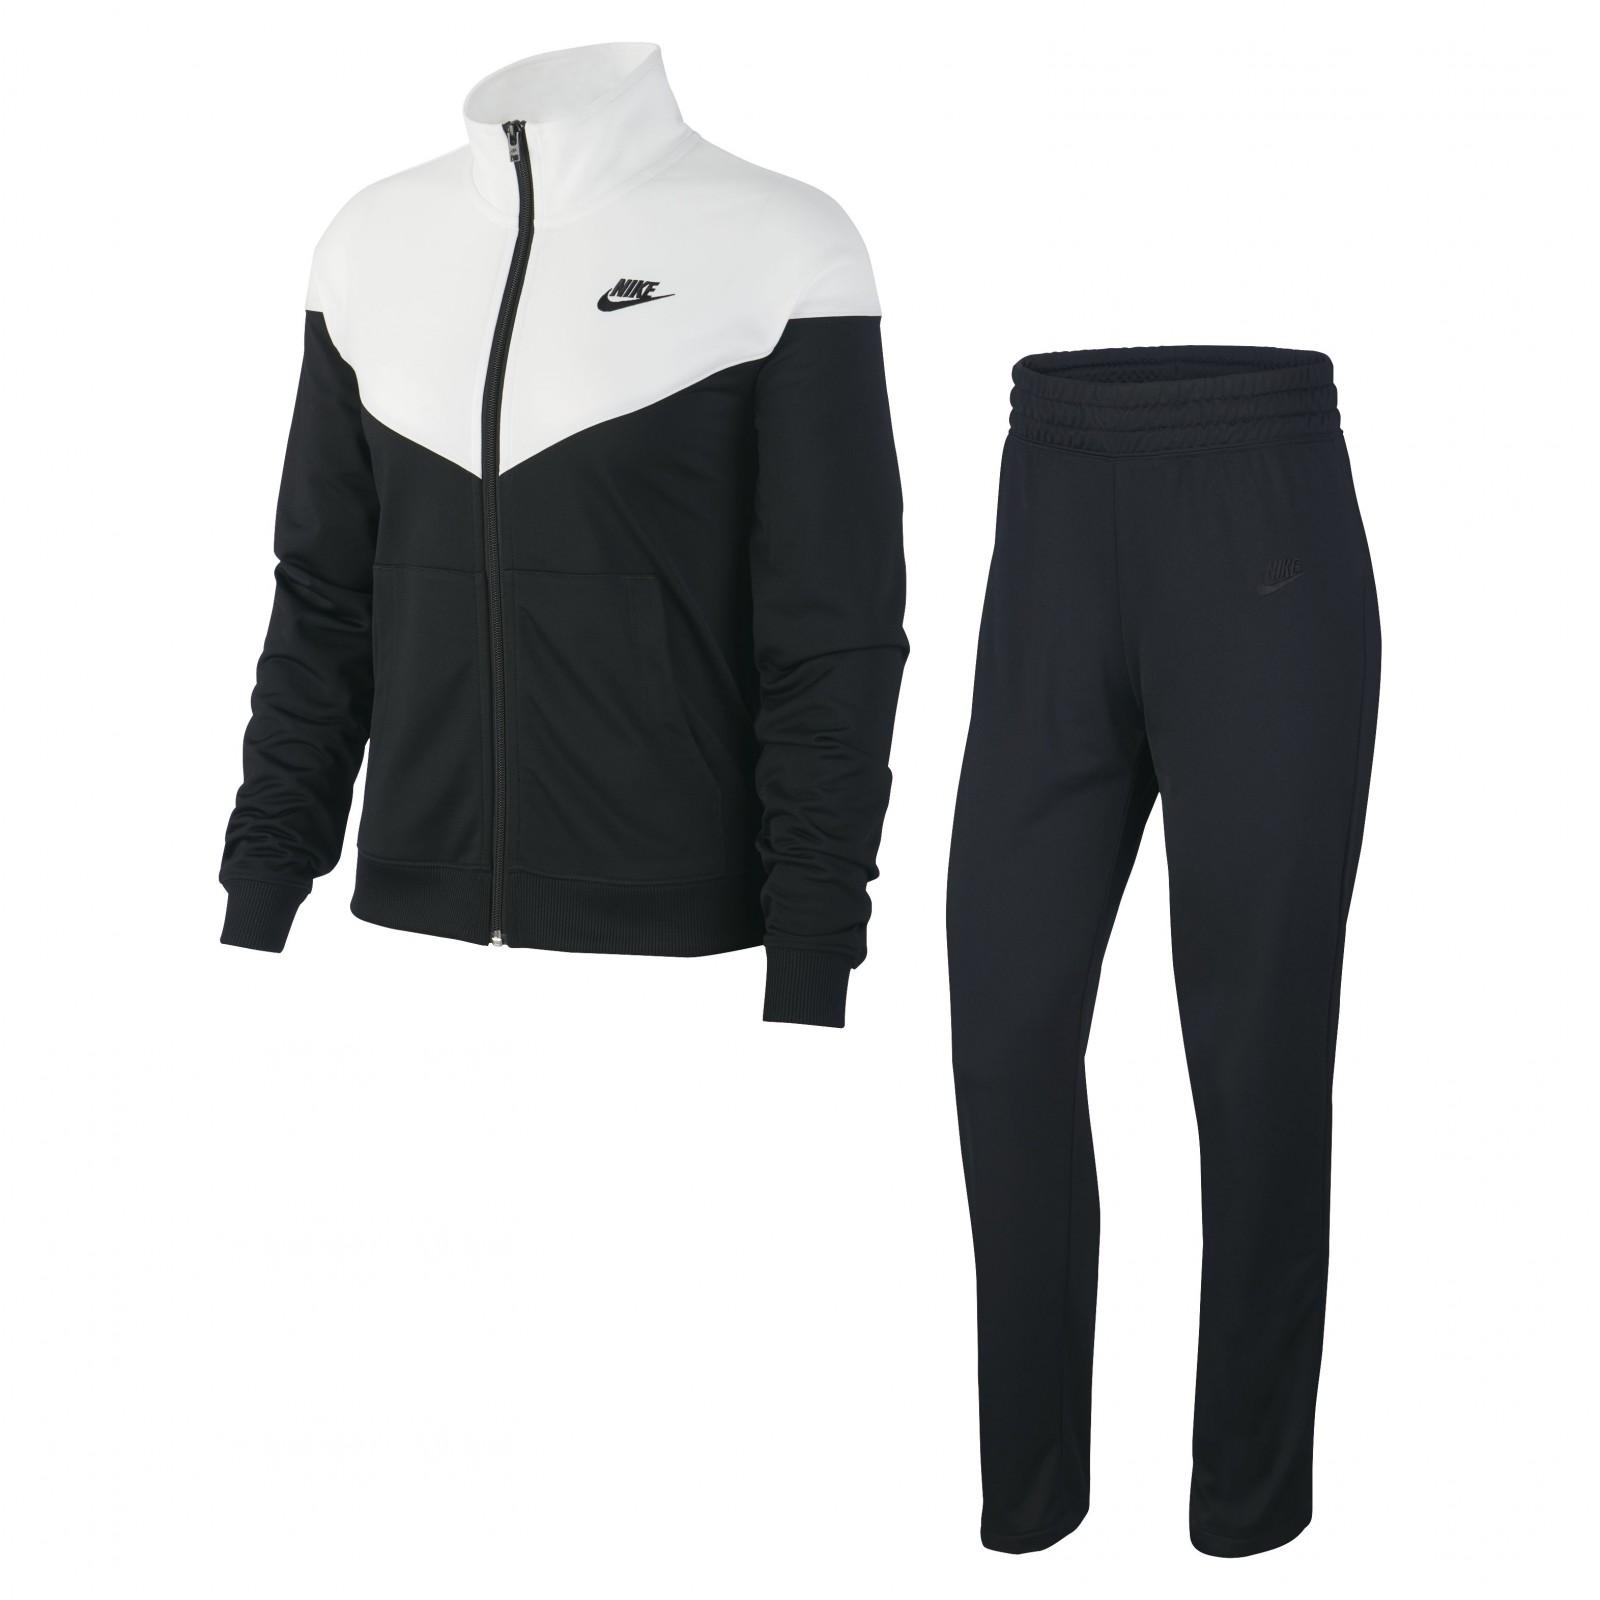 Nike Sportswear BLACK/WHITE/BLACK